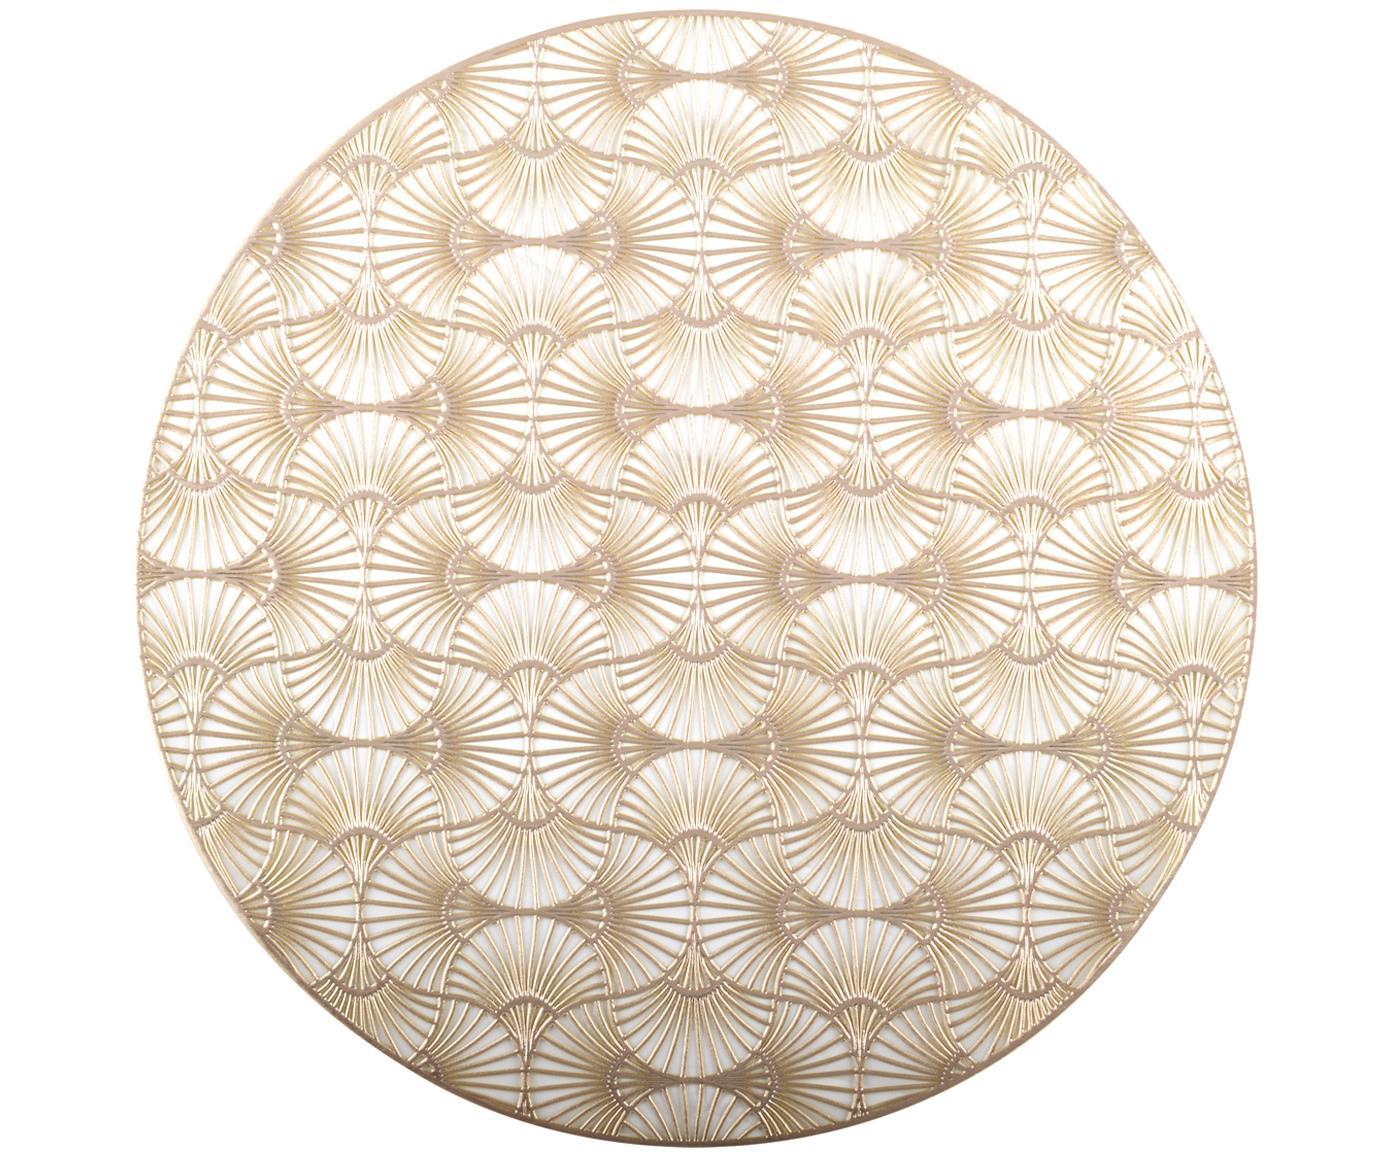 Manteles redondos individuales Ginko, 2uds., Plástico, Dorado, Ø 38 cm